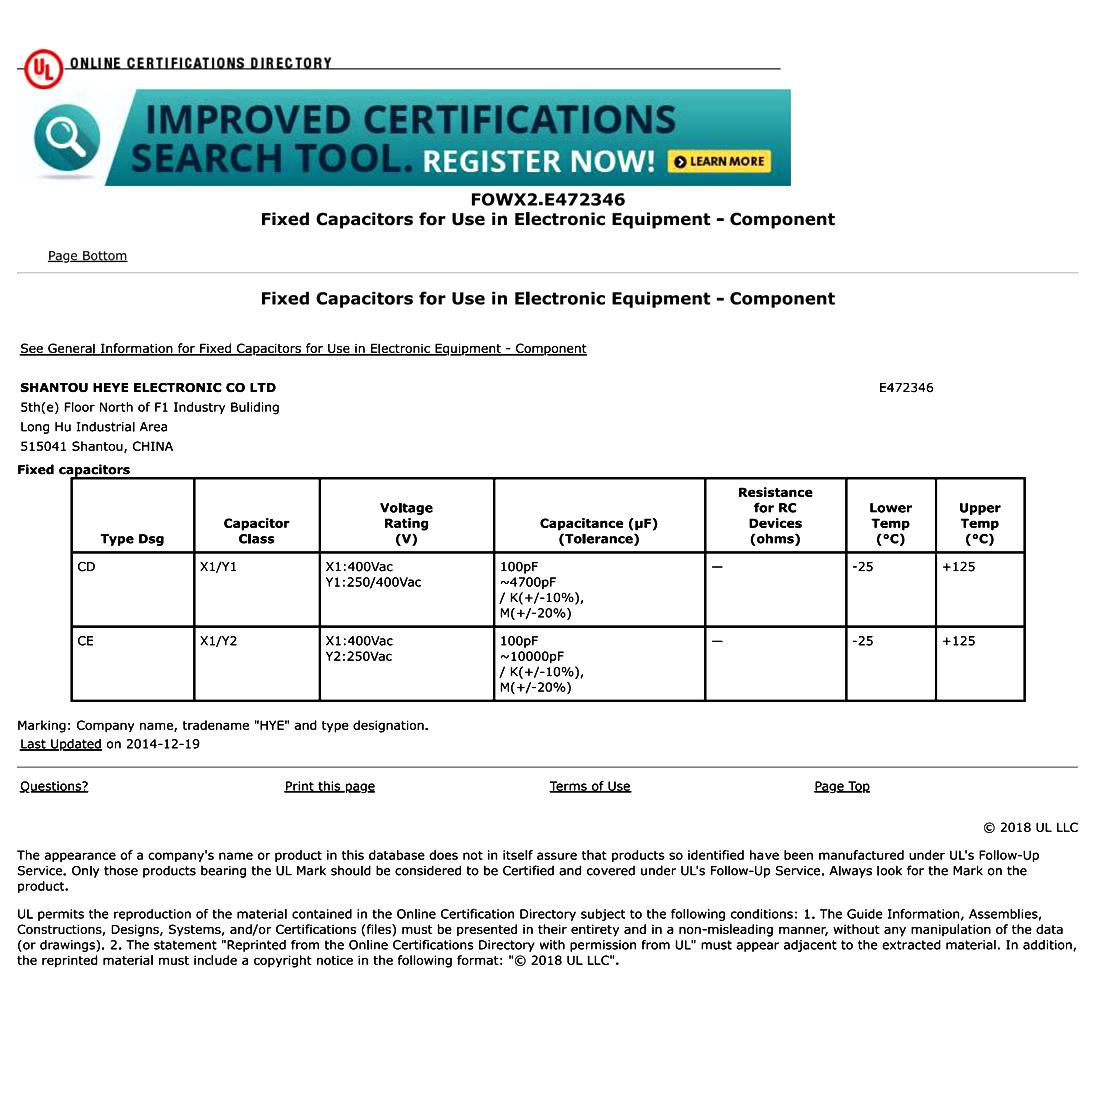 Ceramic Disc Safety Capacitors 4700pF 400V AC Y1 Series L6 50pcs - image 2 of 5